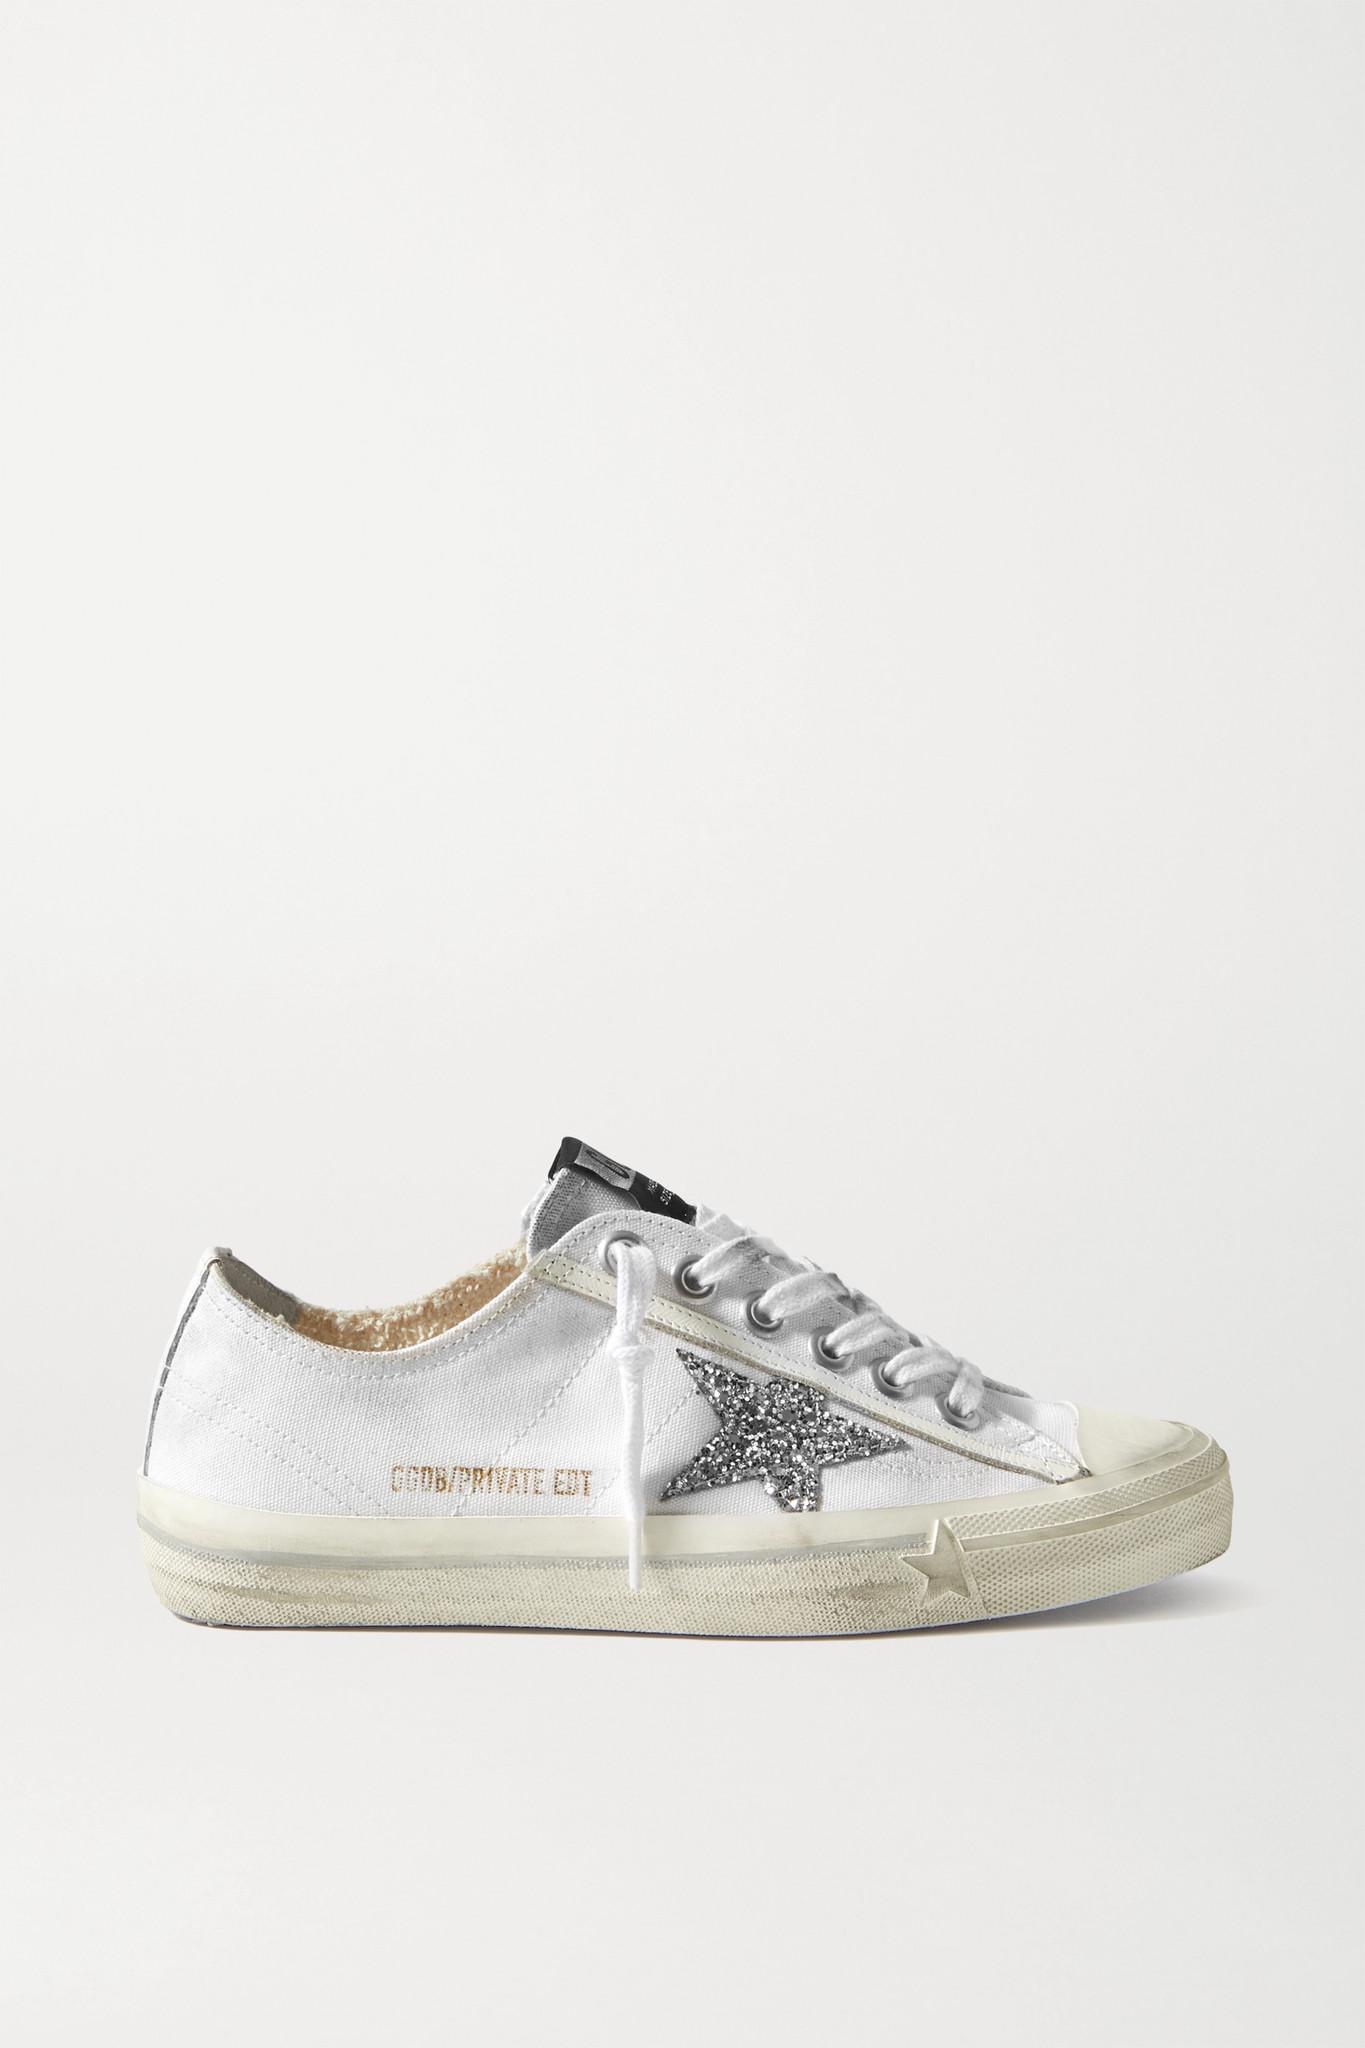 GOLDEN GOOSE - V-star 亮片仿旧帆布运动鞋 - 白色 - IT37